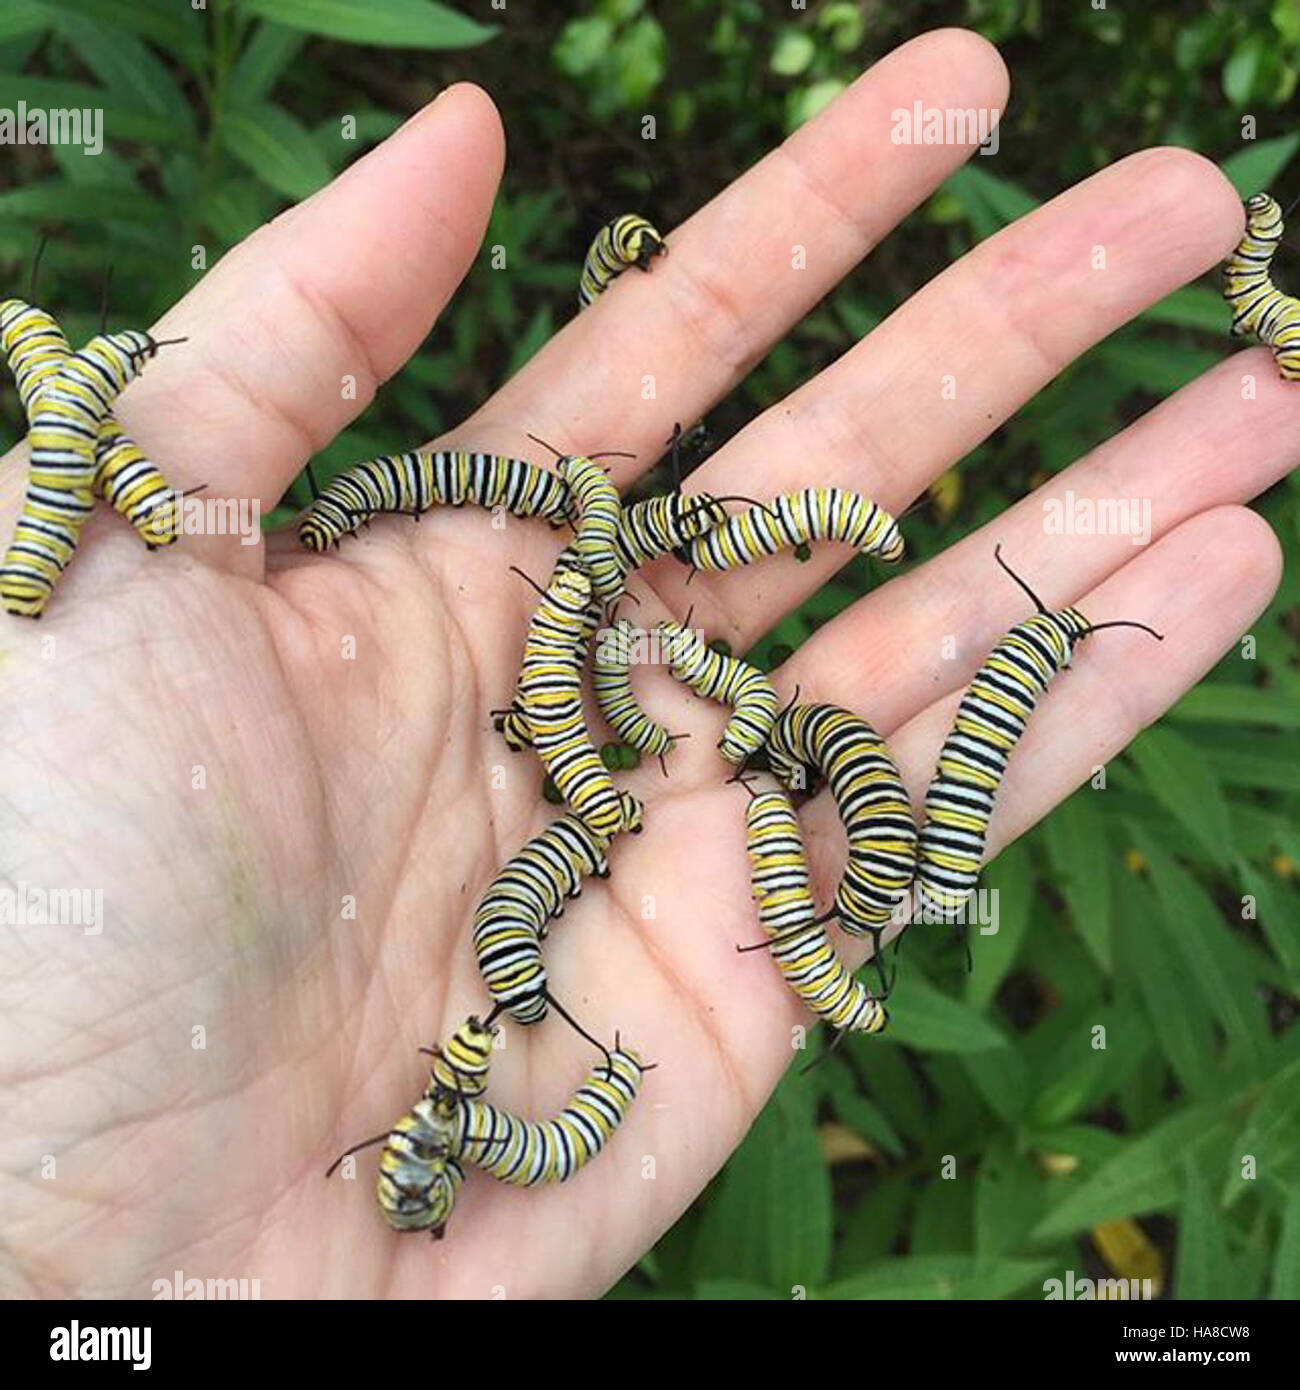 Usfwsmidwest 20845584703 Monarch Caterpillars In Florida